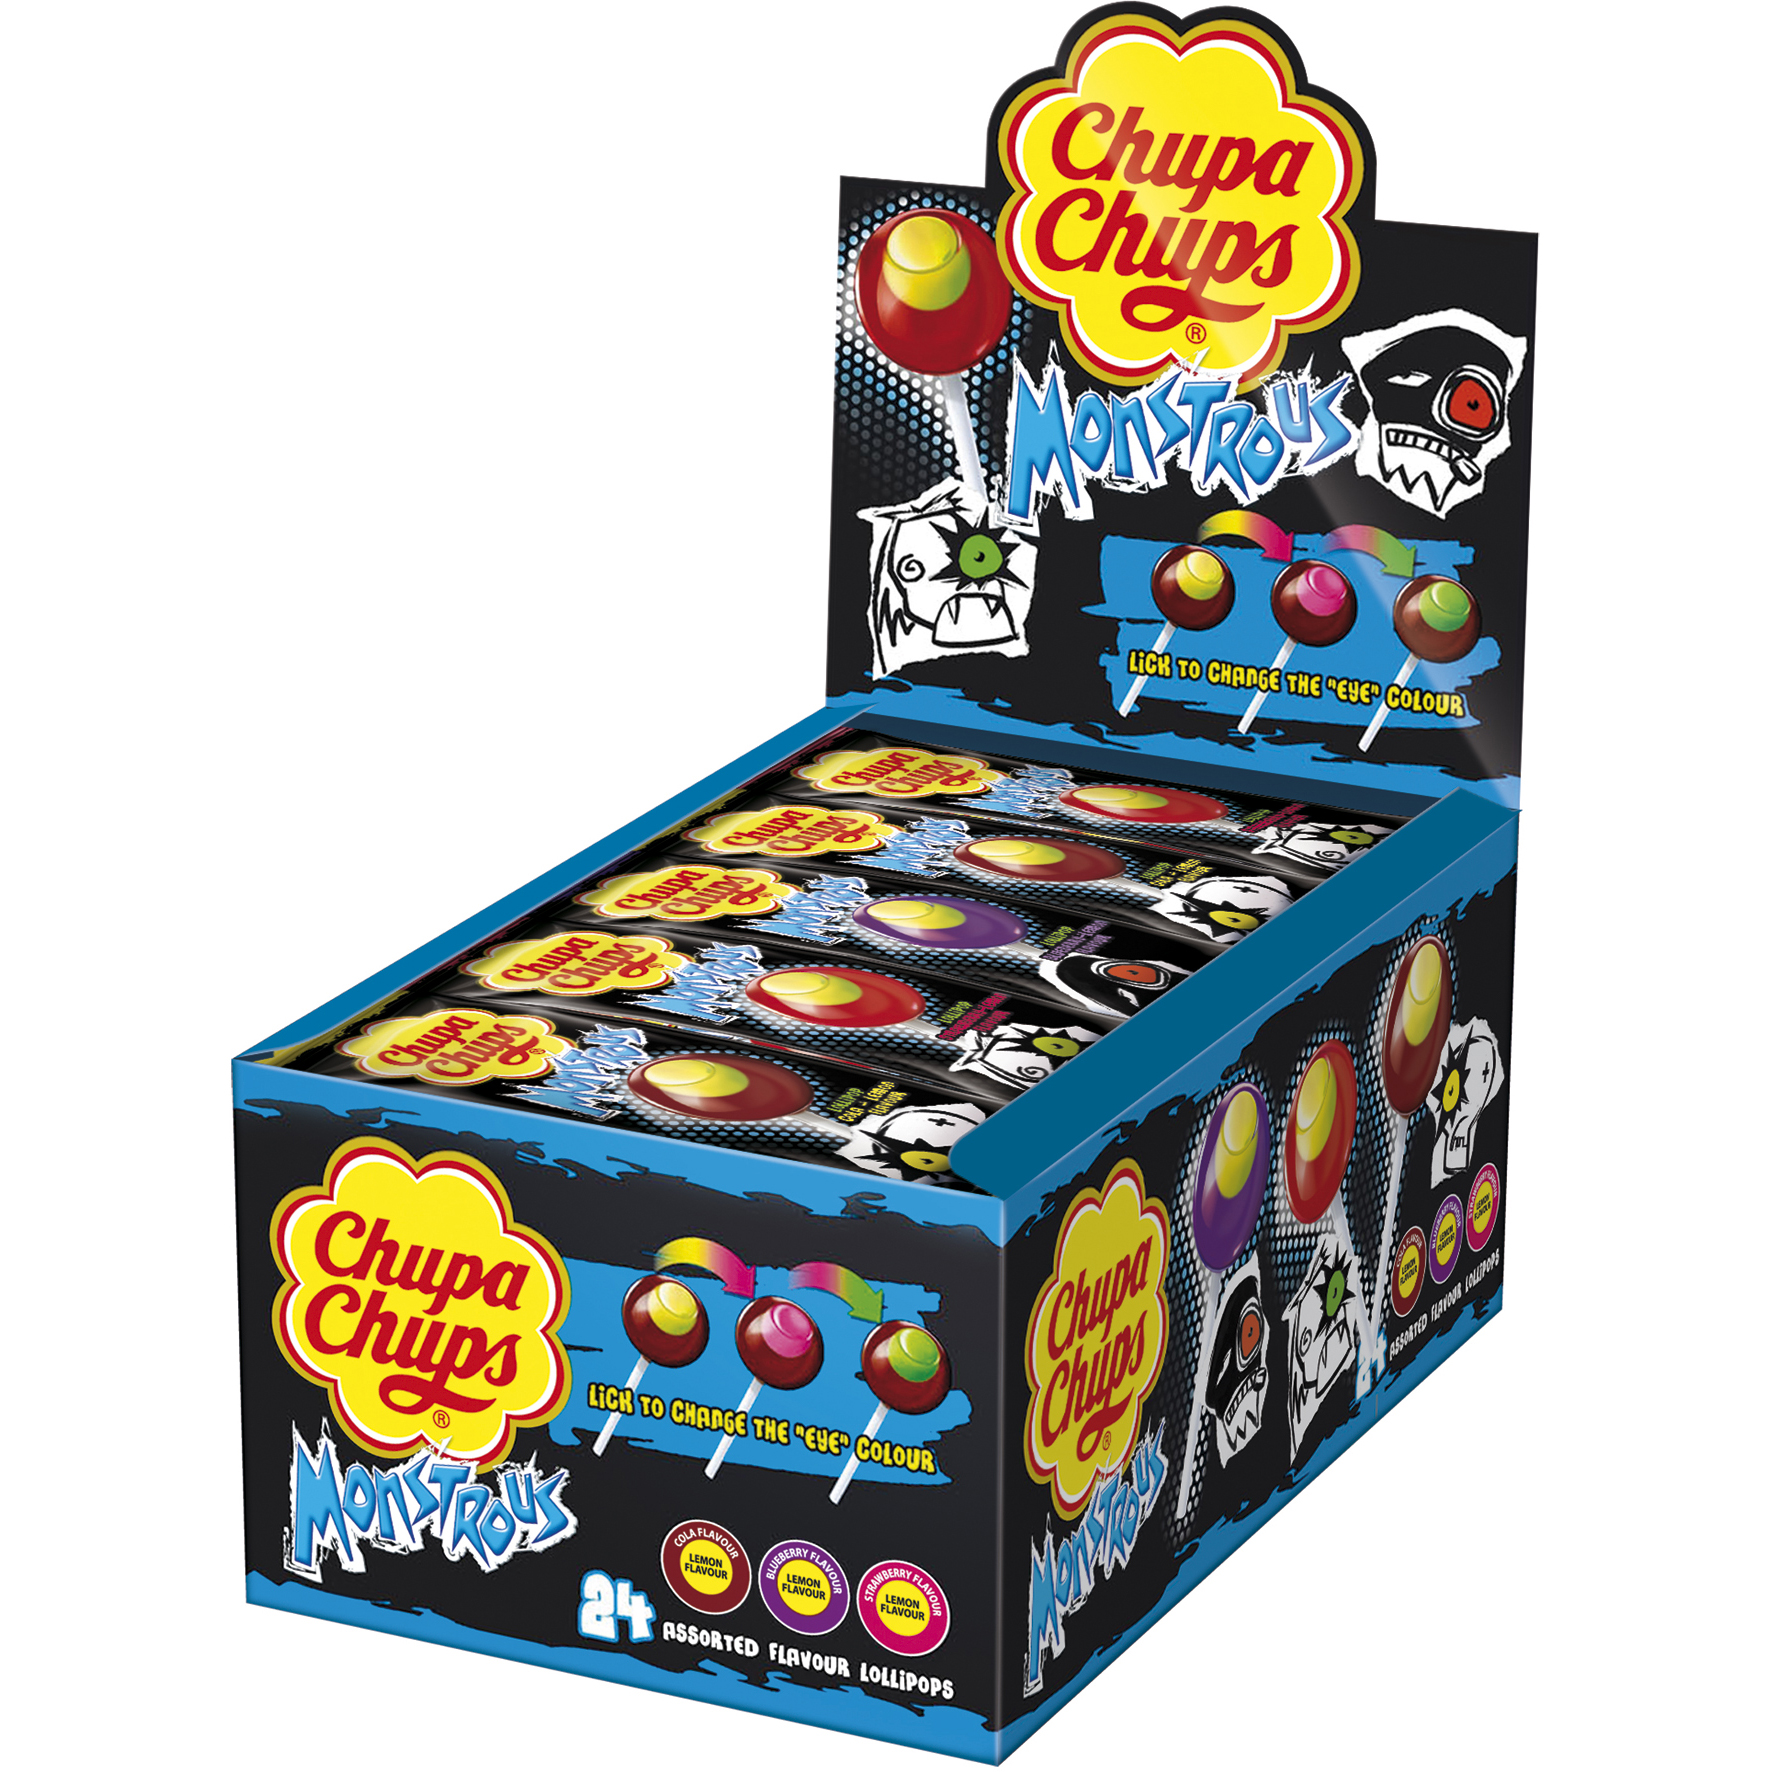 Chupa chups monstrous 24er thekendisplay online kaufen im world of sweets shop - Housse de couette chupa chups ...